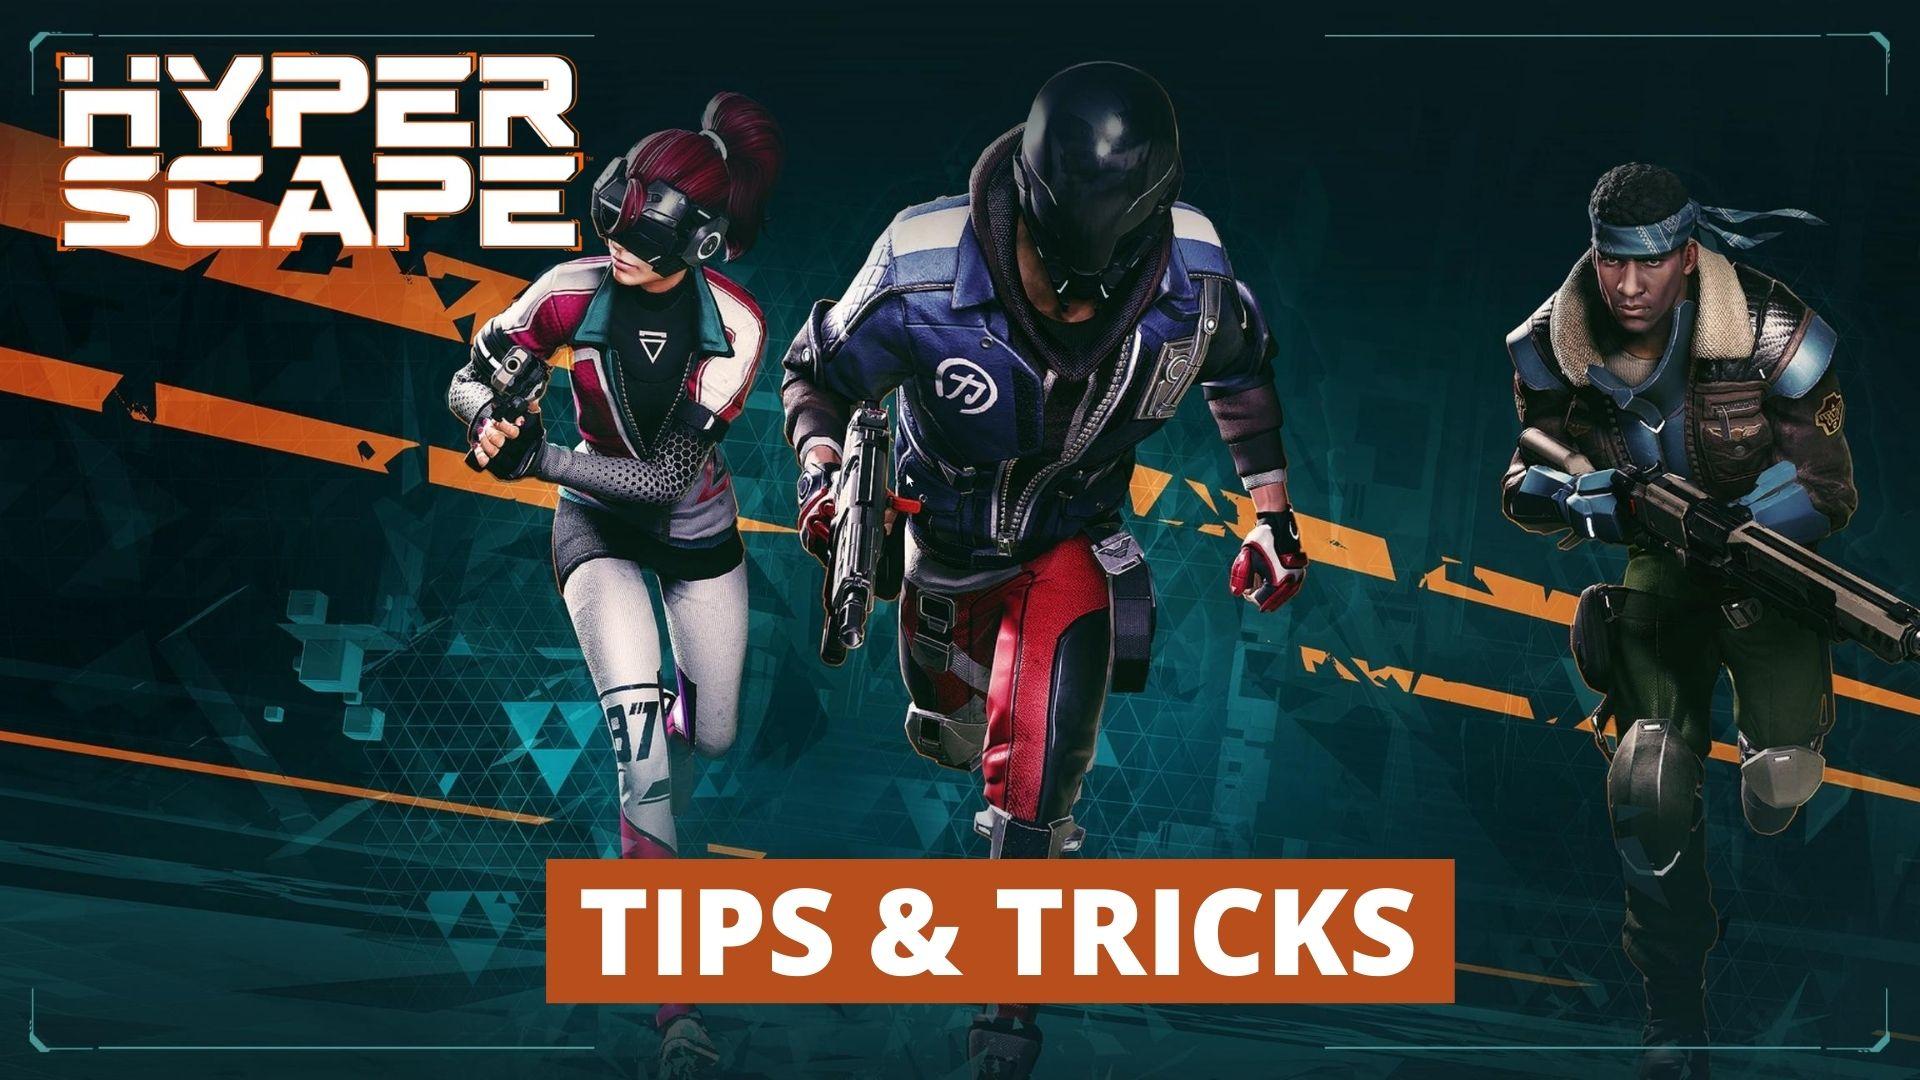 Hyper Scape tips guide